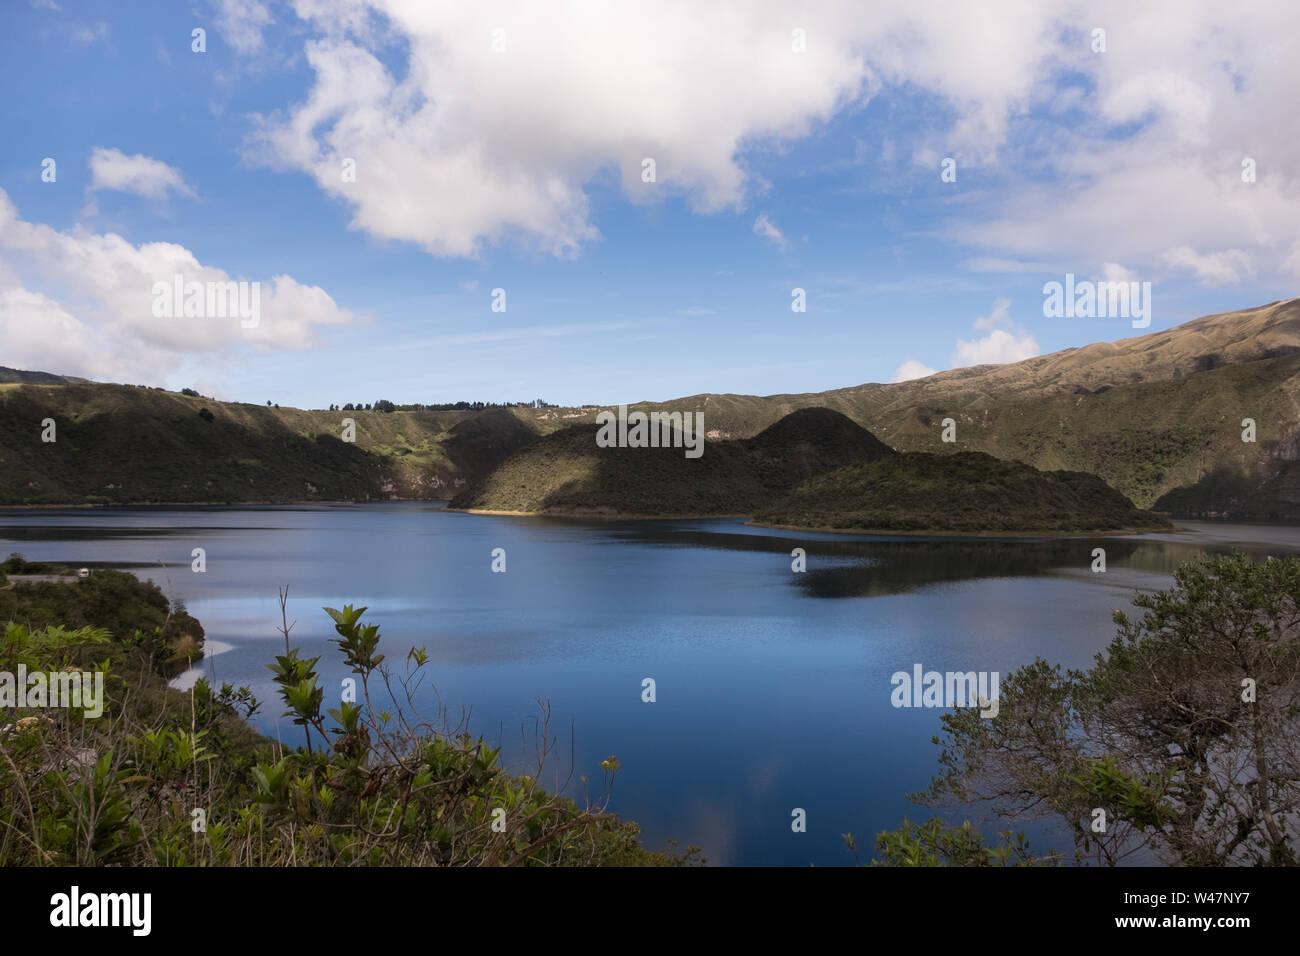 The Cuicocha Lake (Guinea Pig Lake) Stock Photo